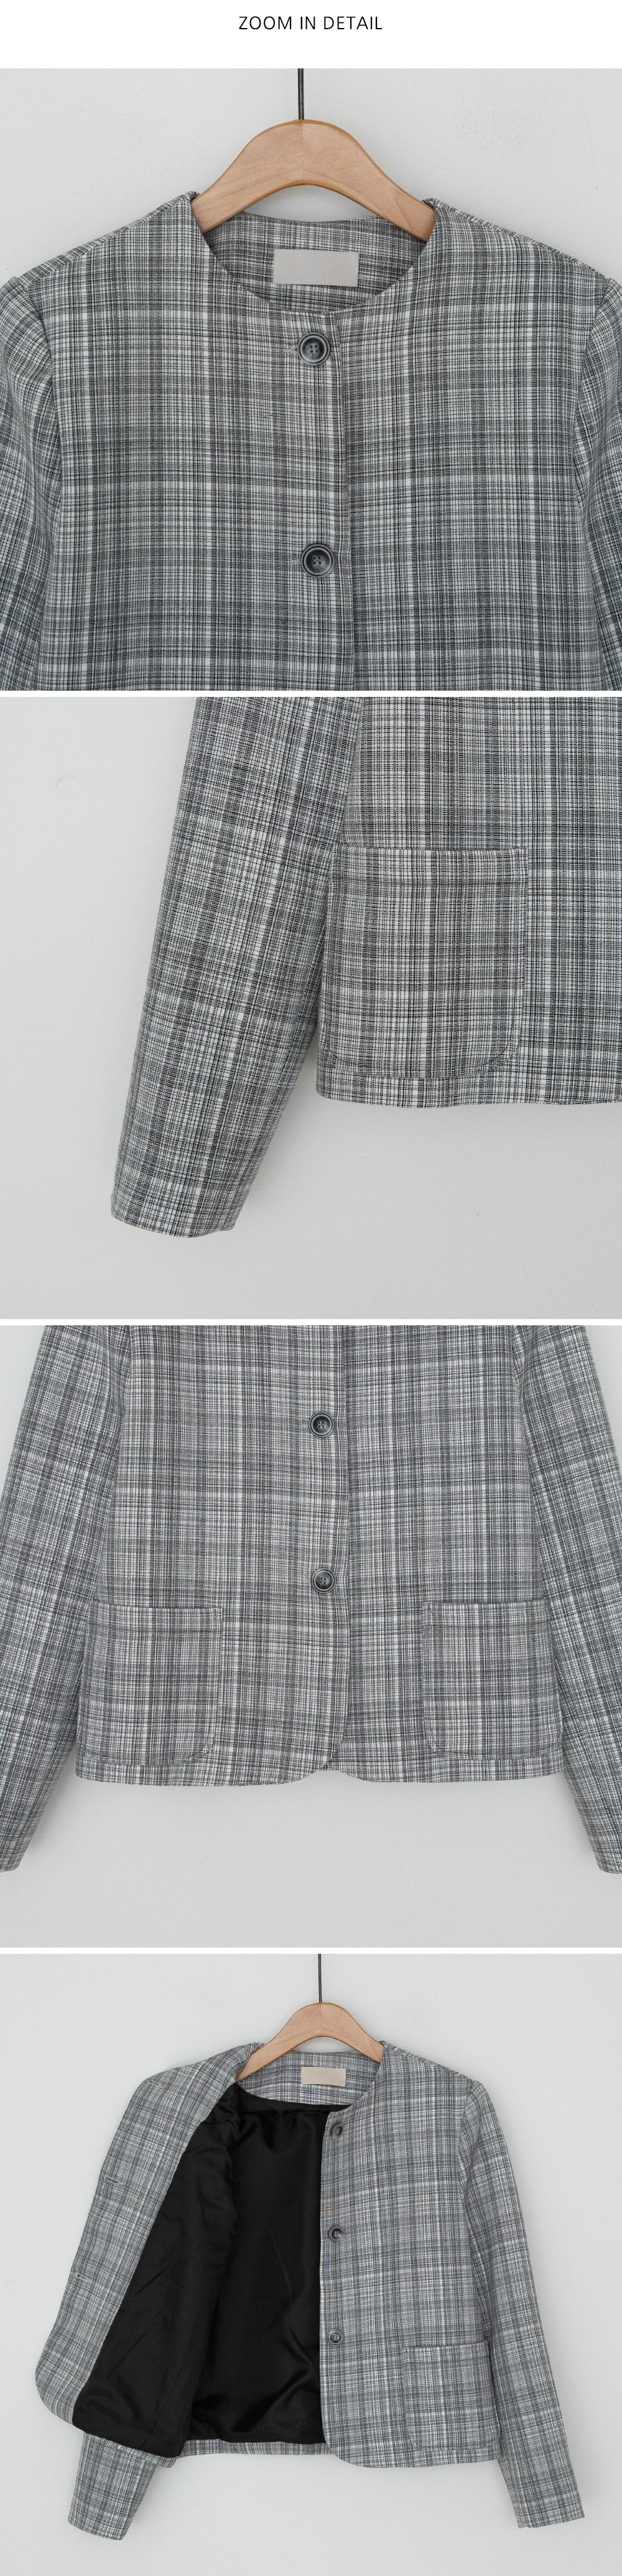 Round no collar neck check jacket